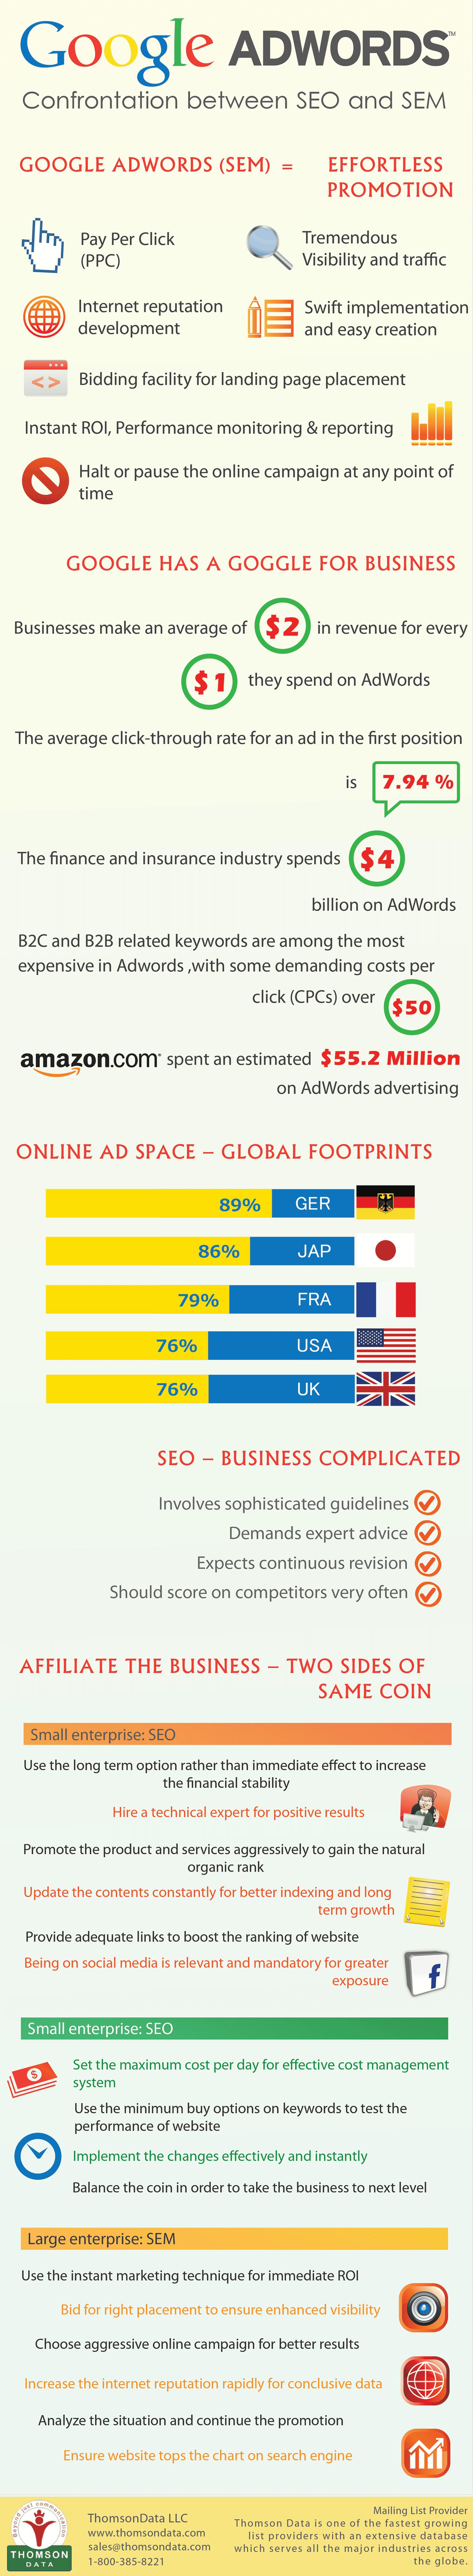 google-adwords-info